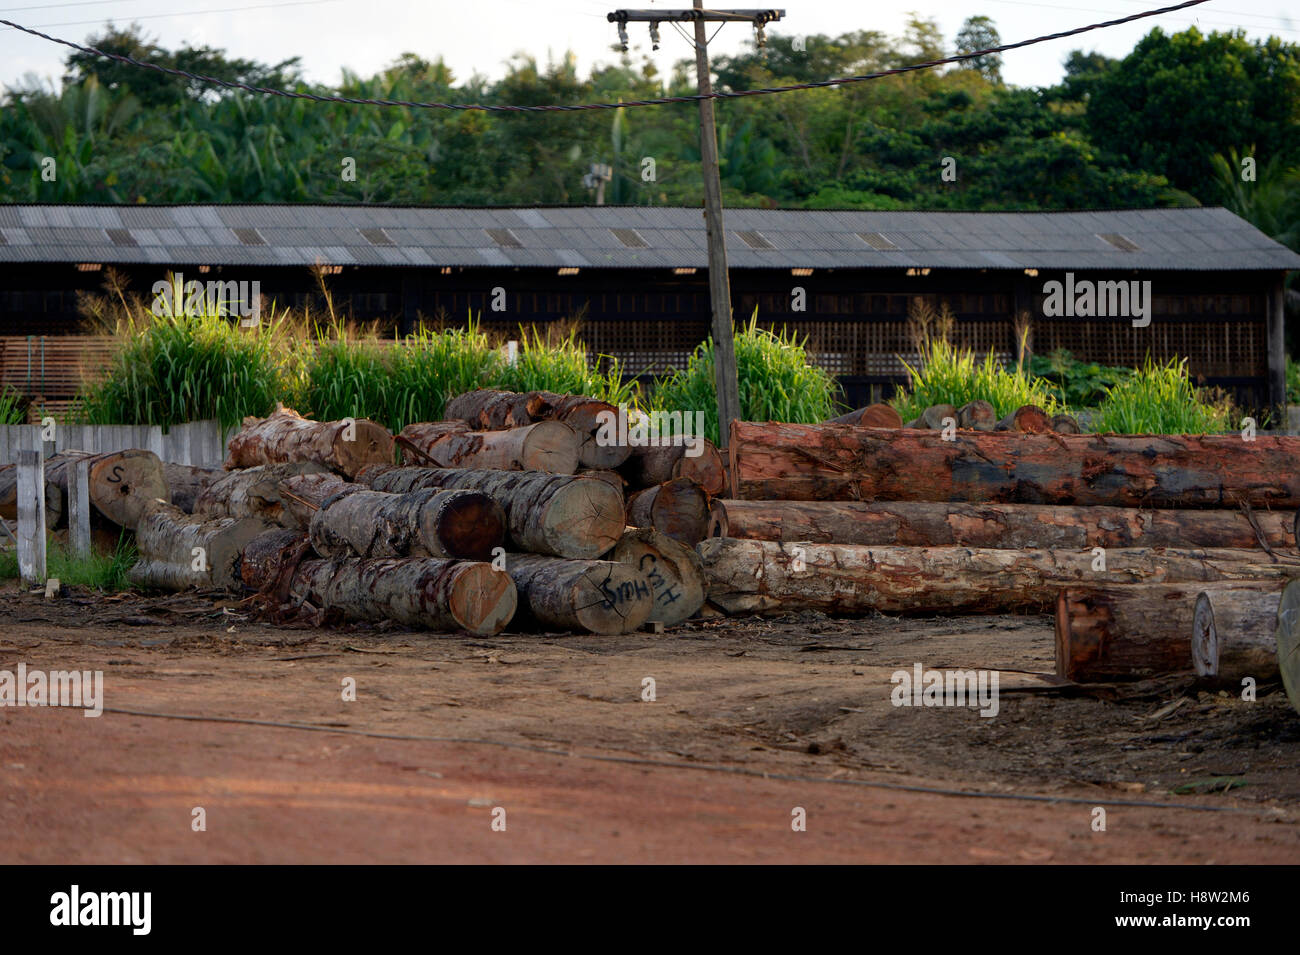 Sawmill, illegal logging, Amazon rainforest, Trairão, Trairão District, Pará, Brazil - Stock Image